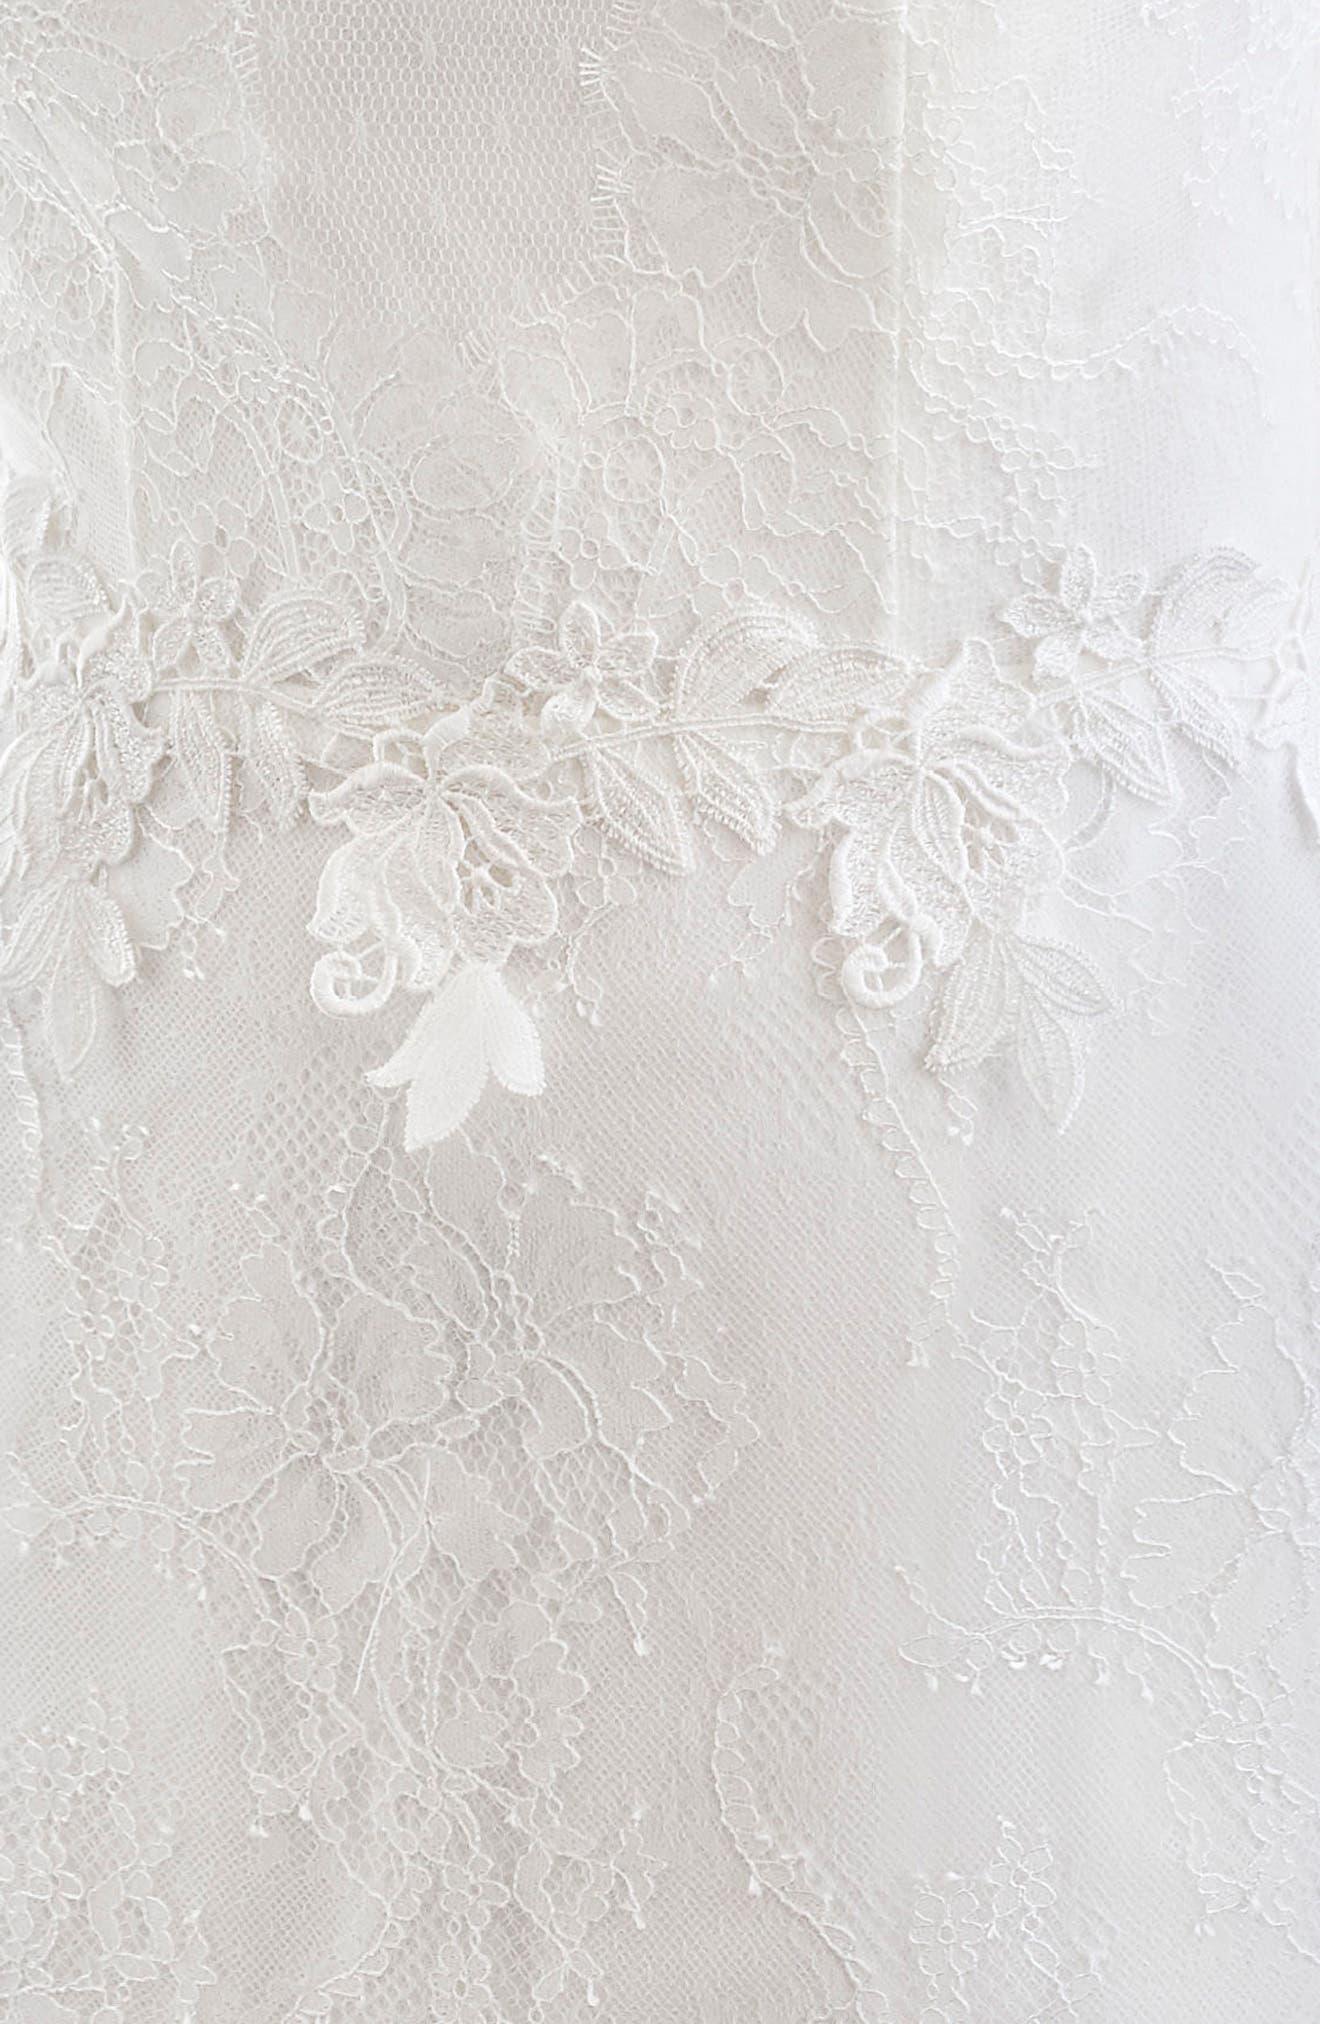 Inmaculada García Rubi Bell Sleeve Illusion Sheath Gown,                             Alternate thumbnail 3, color,                             Ivory